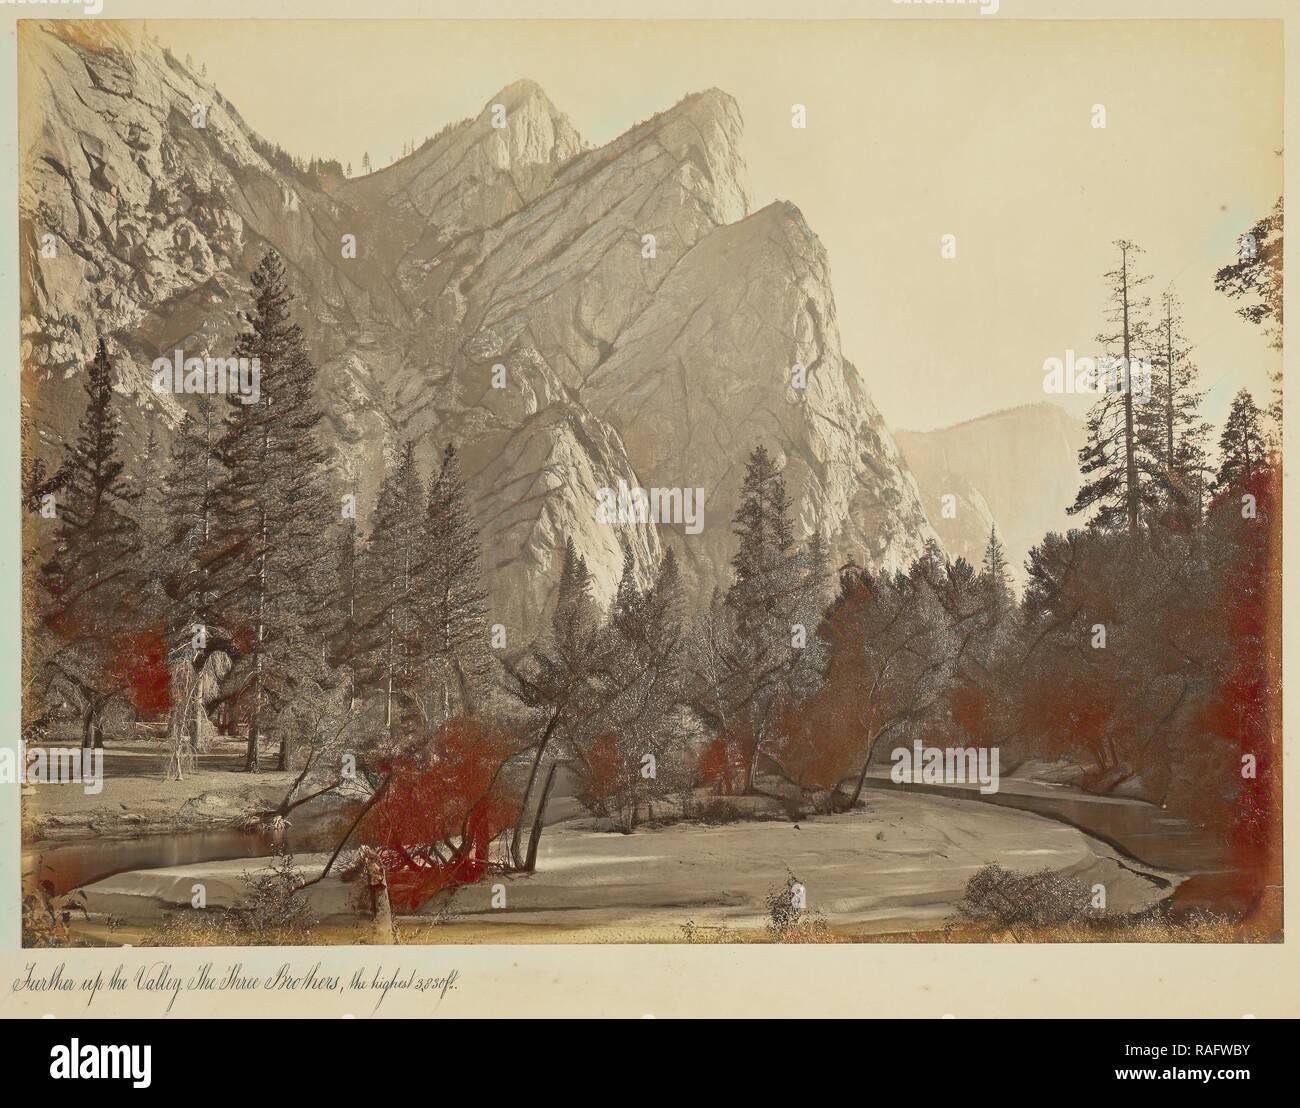 The Three Brothers, 4,480 Feet, Yosemite, No. 804, Carleton Watkins (American, 1829 - 1916), Yosemite, California reimagined - Stock Image